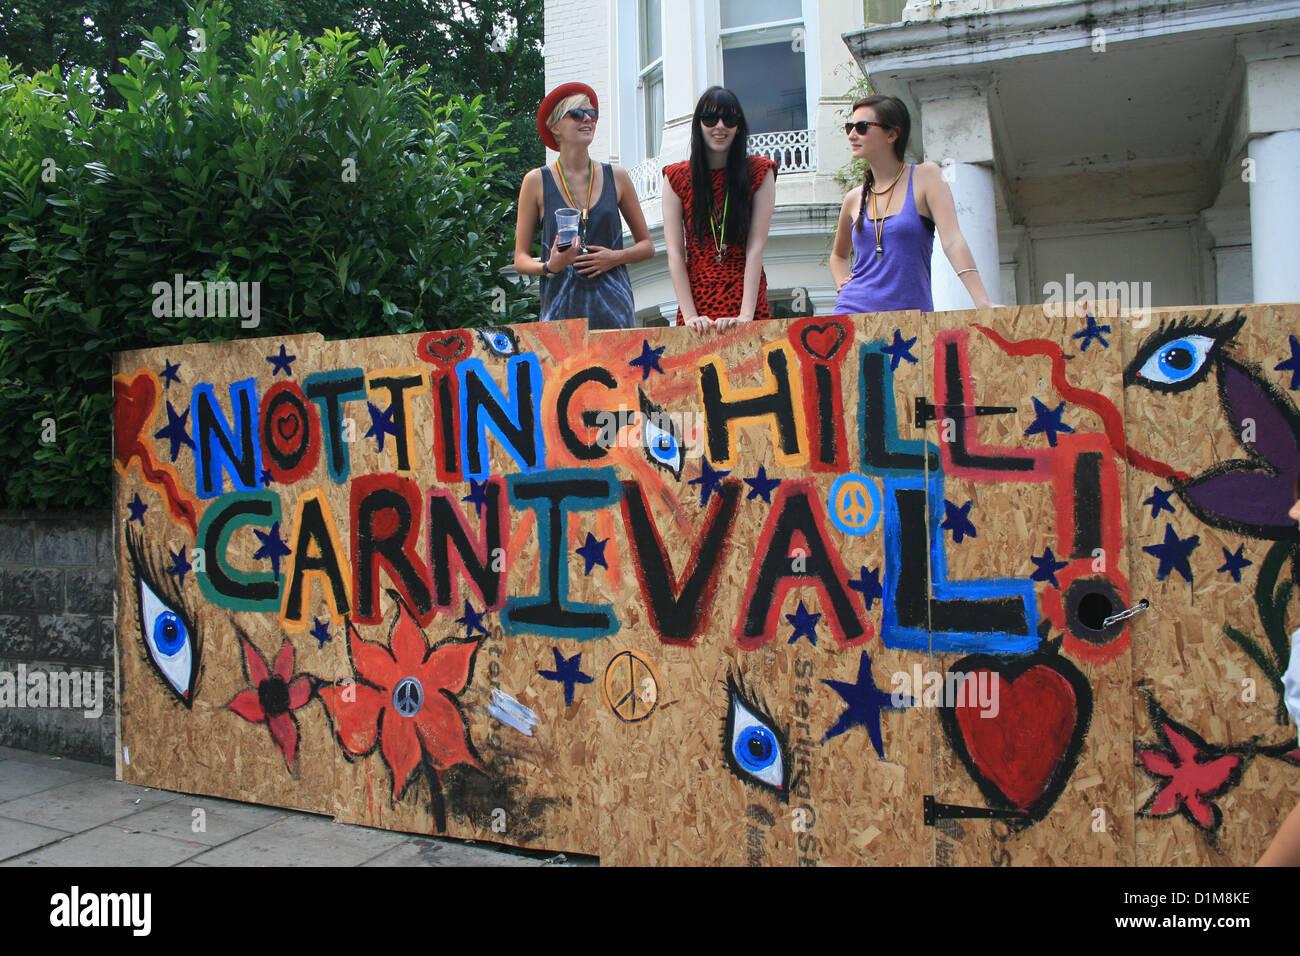 Notting Hill Carnival, London - Stock Image